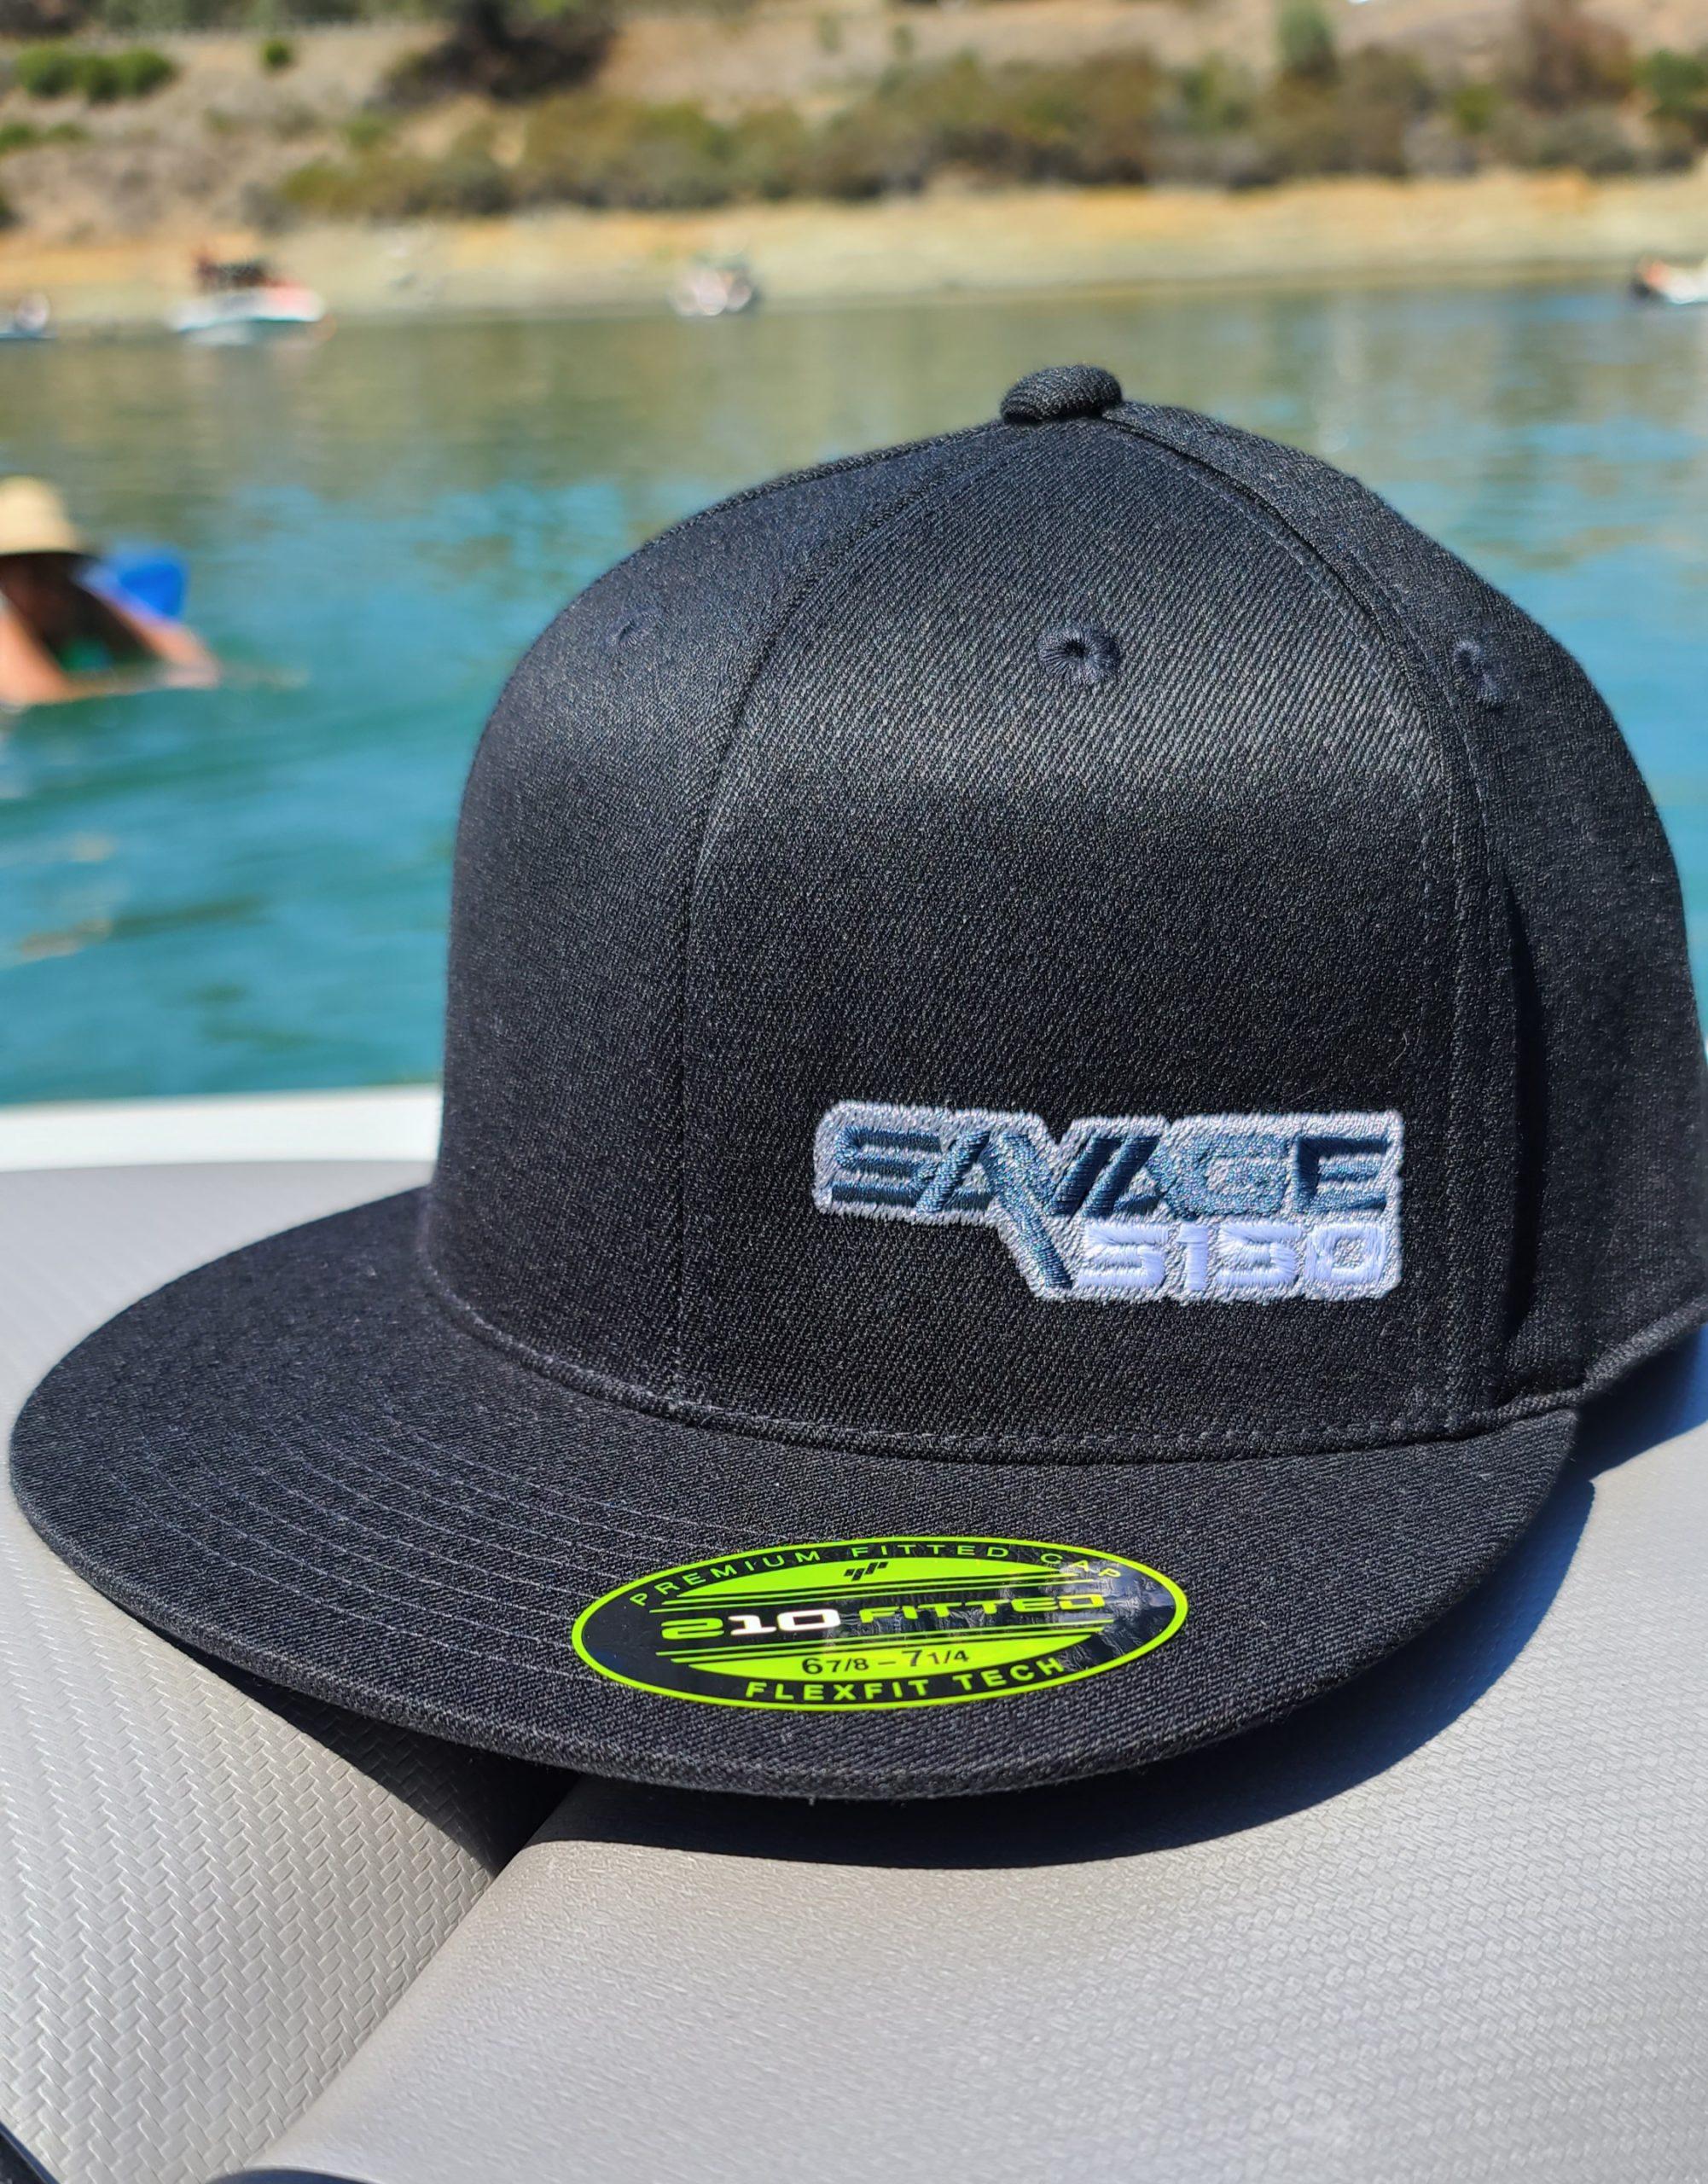 Designer Hat - Sleek